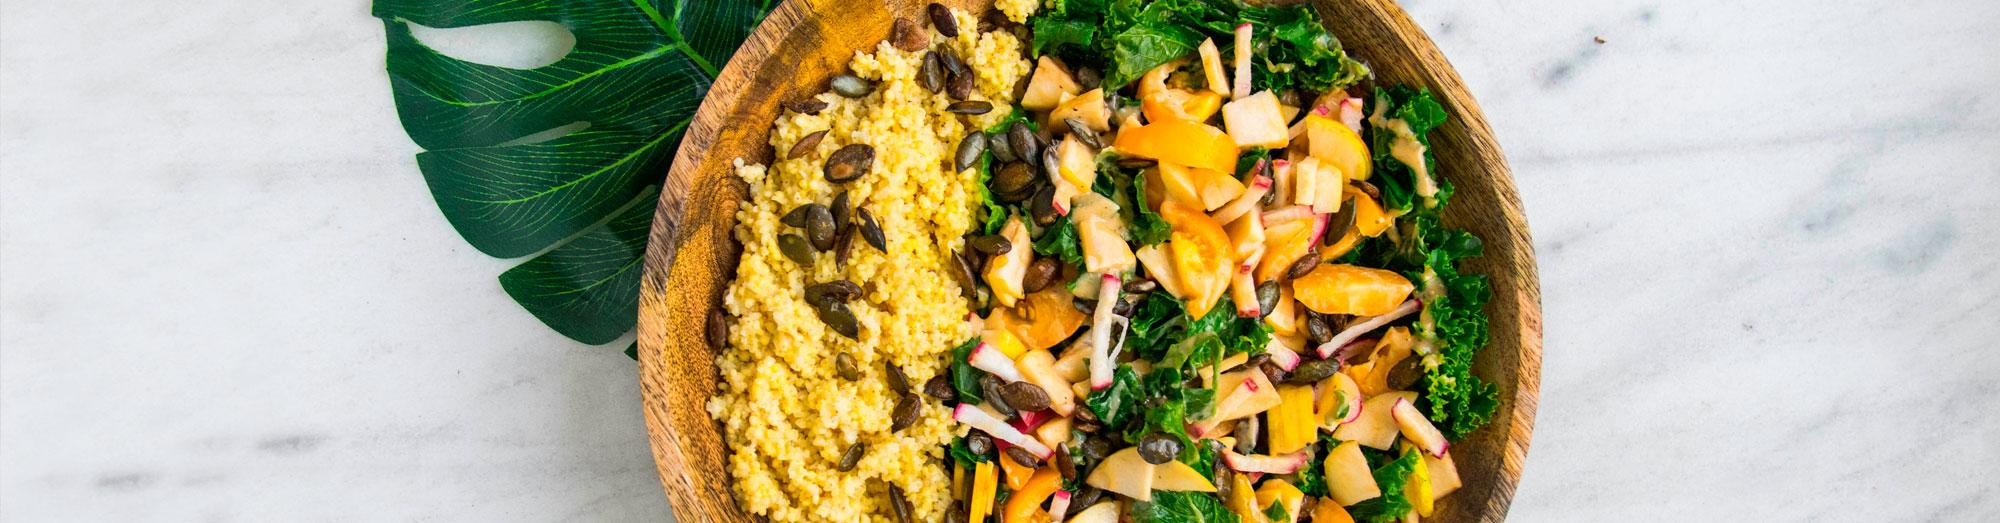 Ricetta per l'insalata di cous-cous